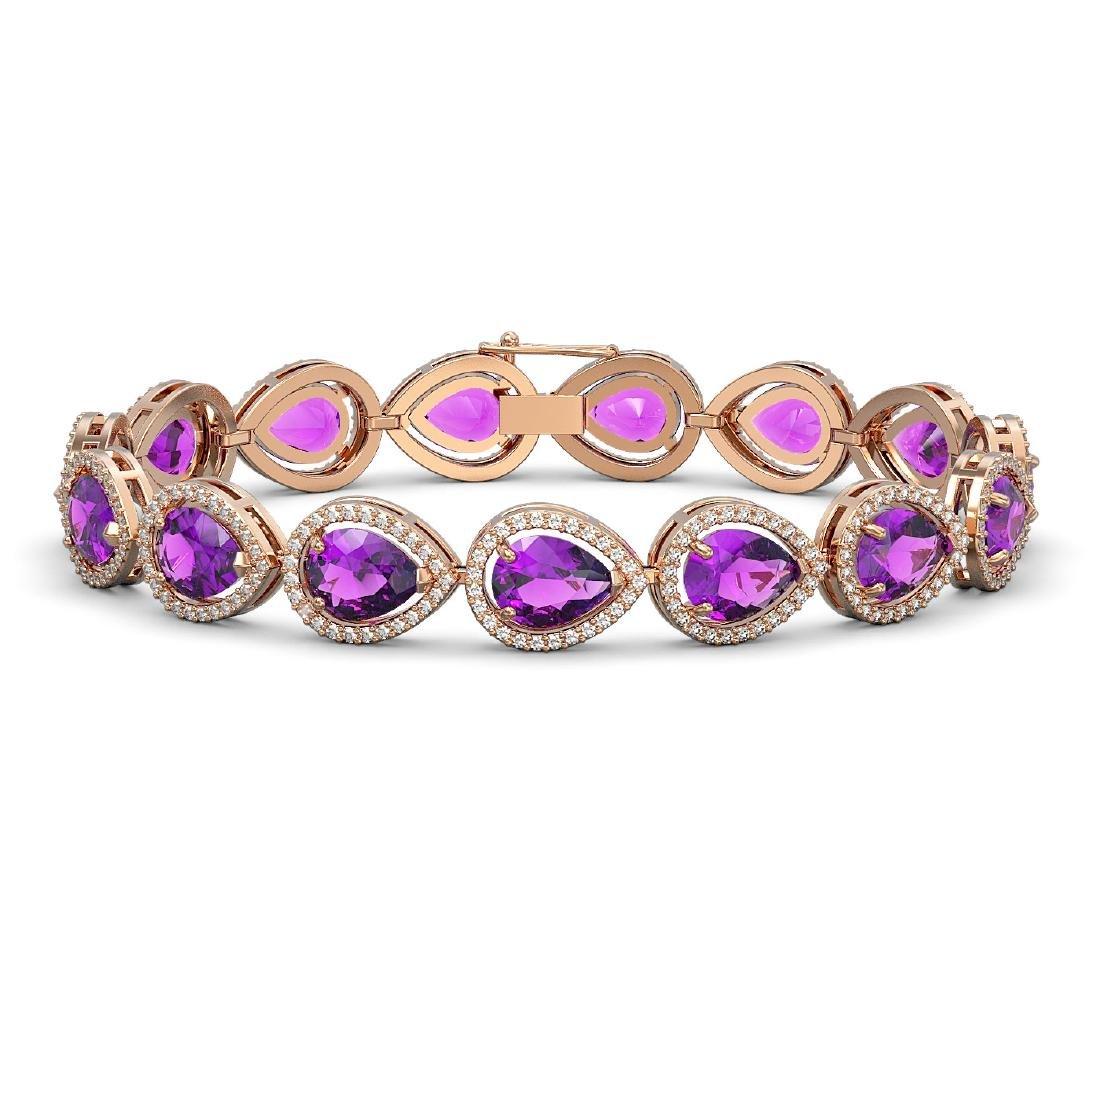 20.3 CTW Amethyst & Diamond Halo Bracelet 10K Rose Gold